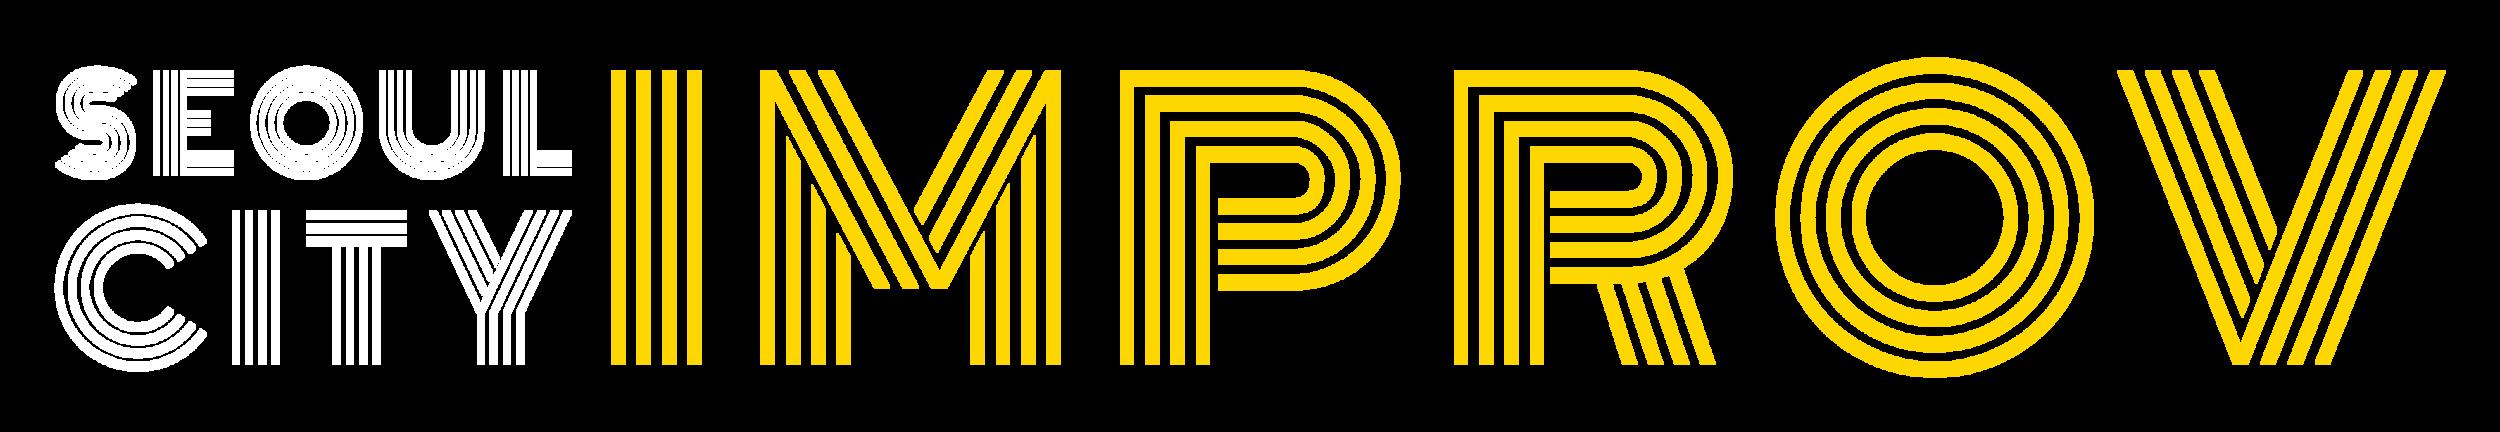 Seoul City Improv Logo Full Primary.png